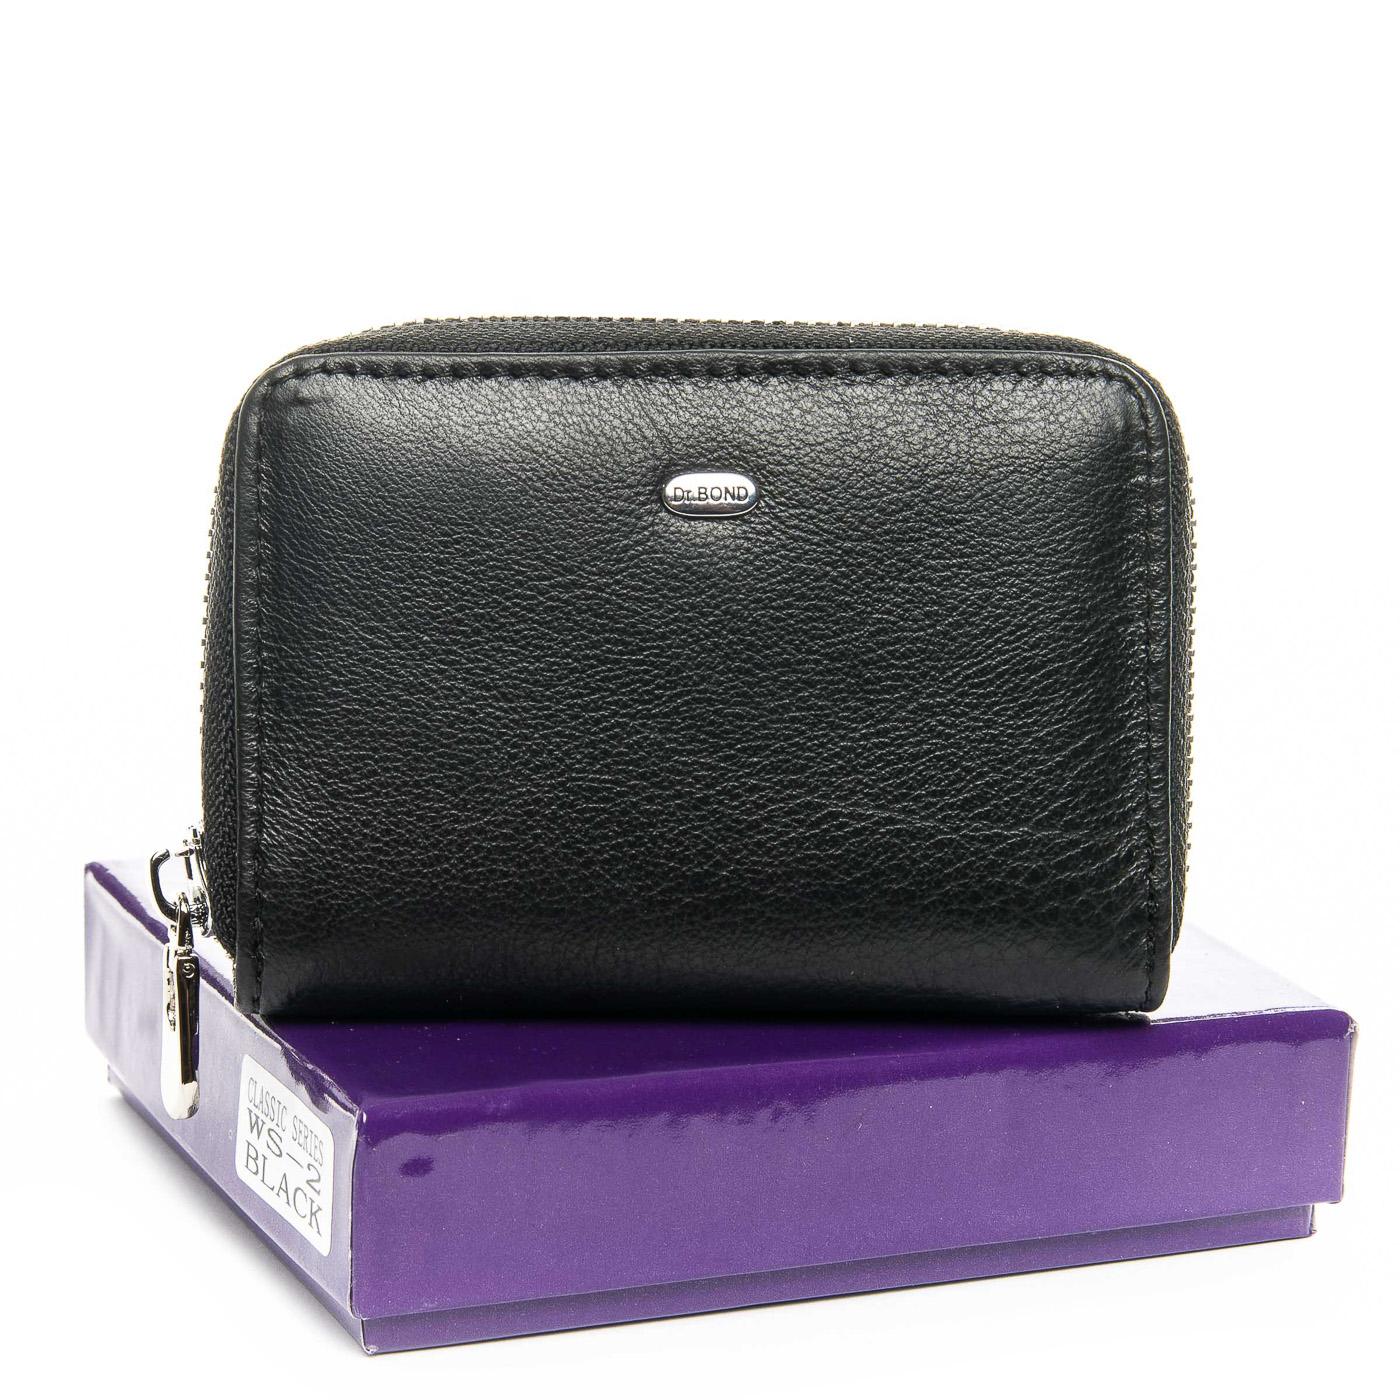 Кошелек Classic кожа DR. BOND WS-2 black цв коробка